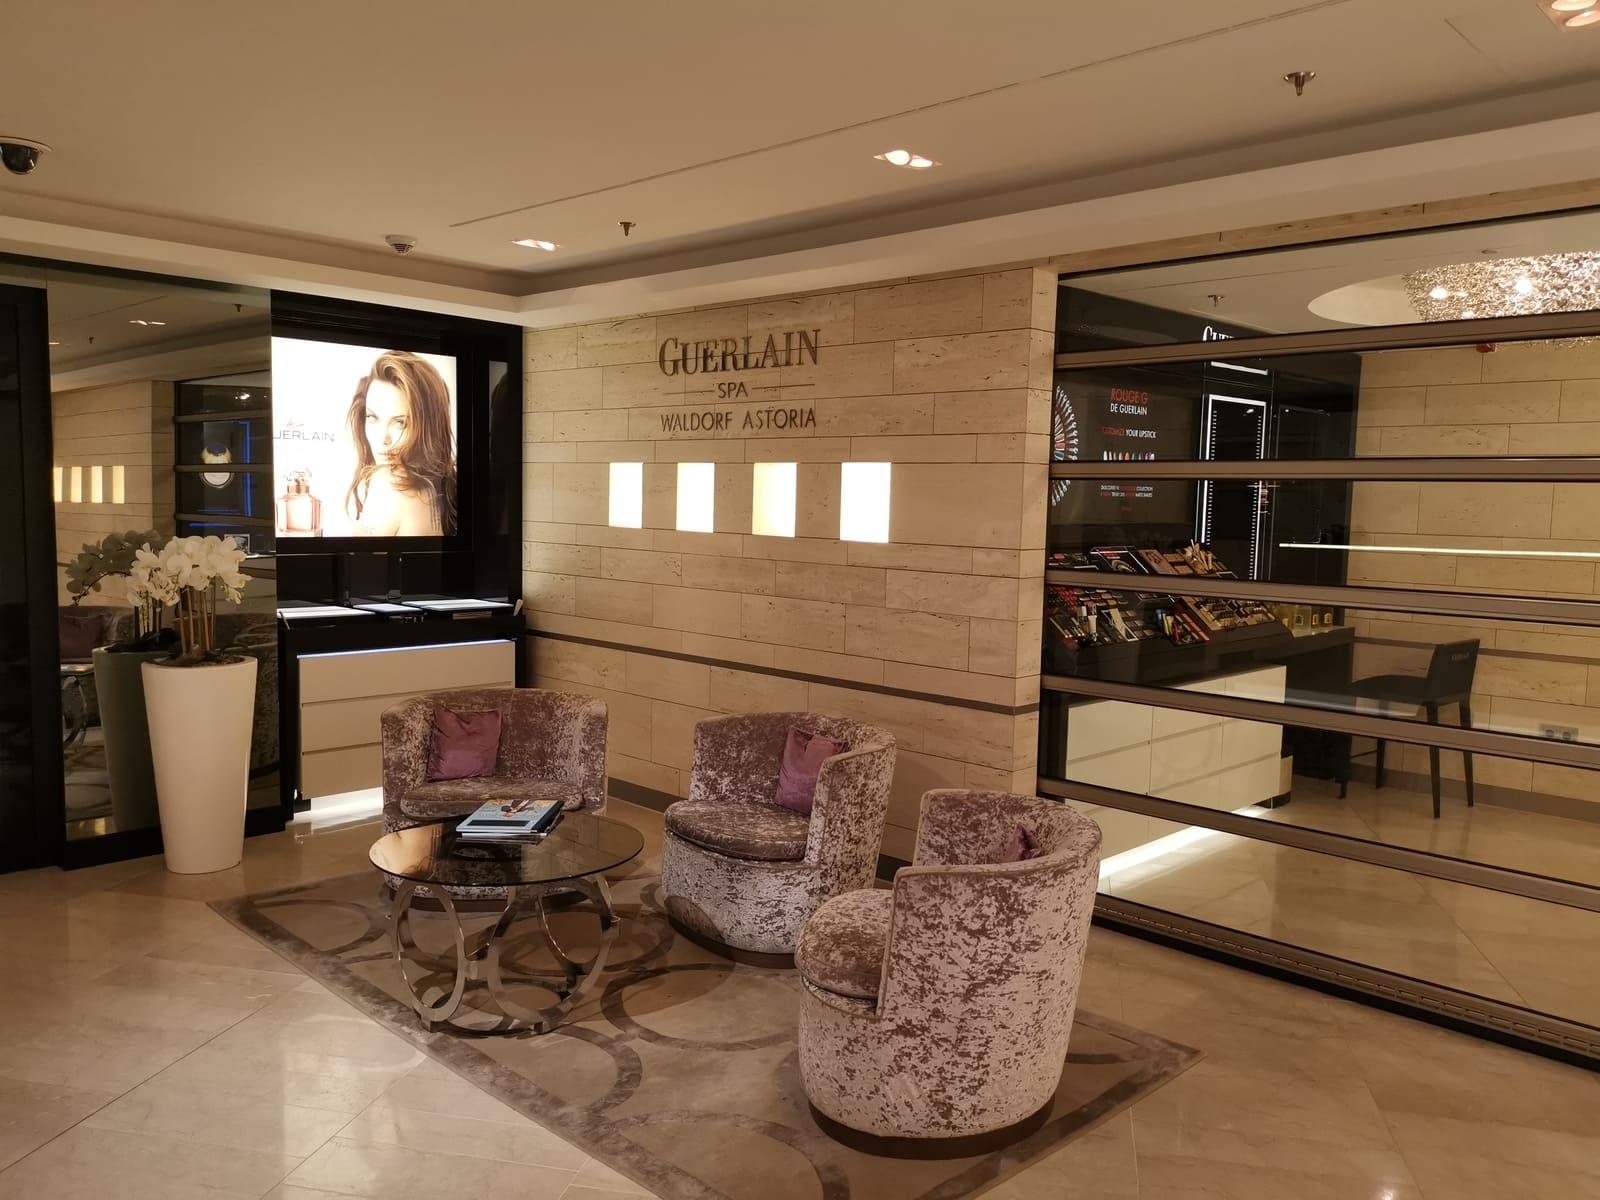 Waldorf Astoria Berlin Spa